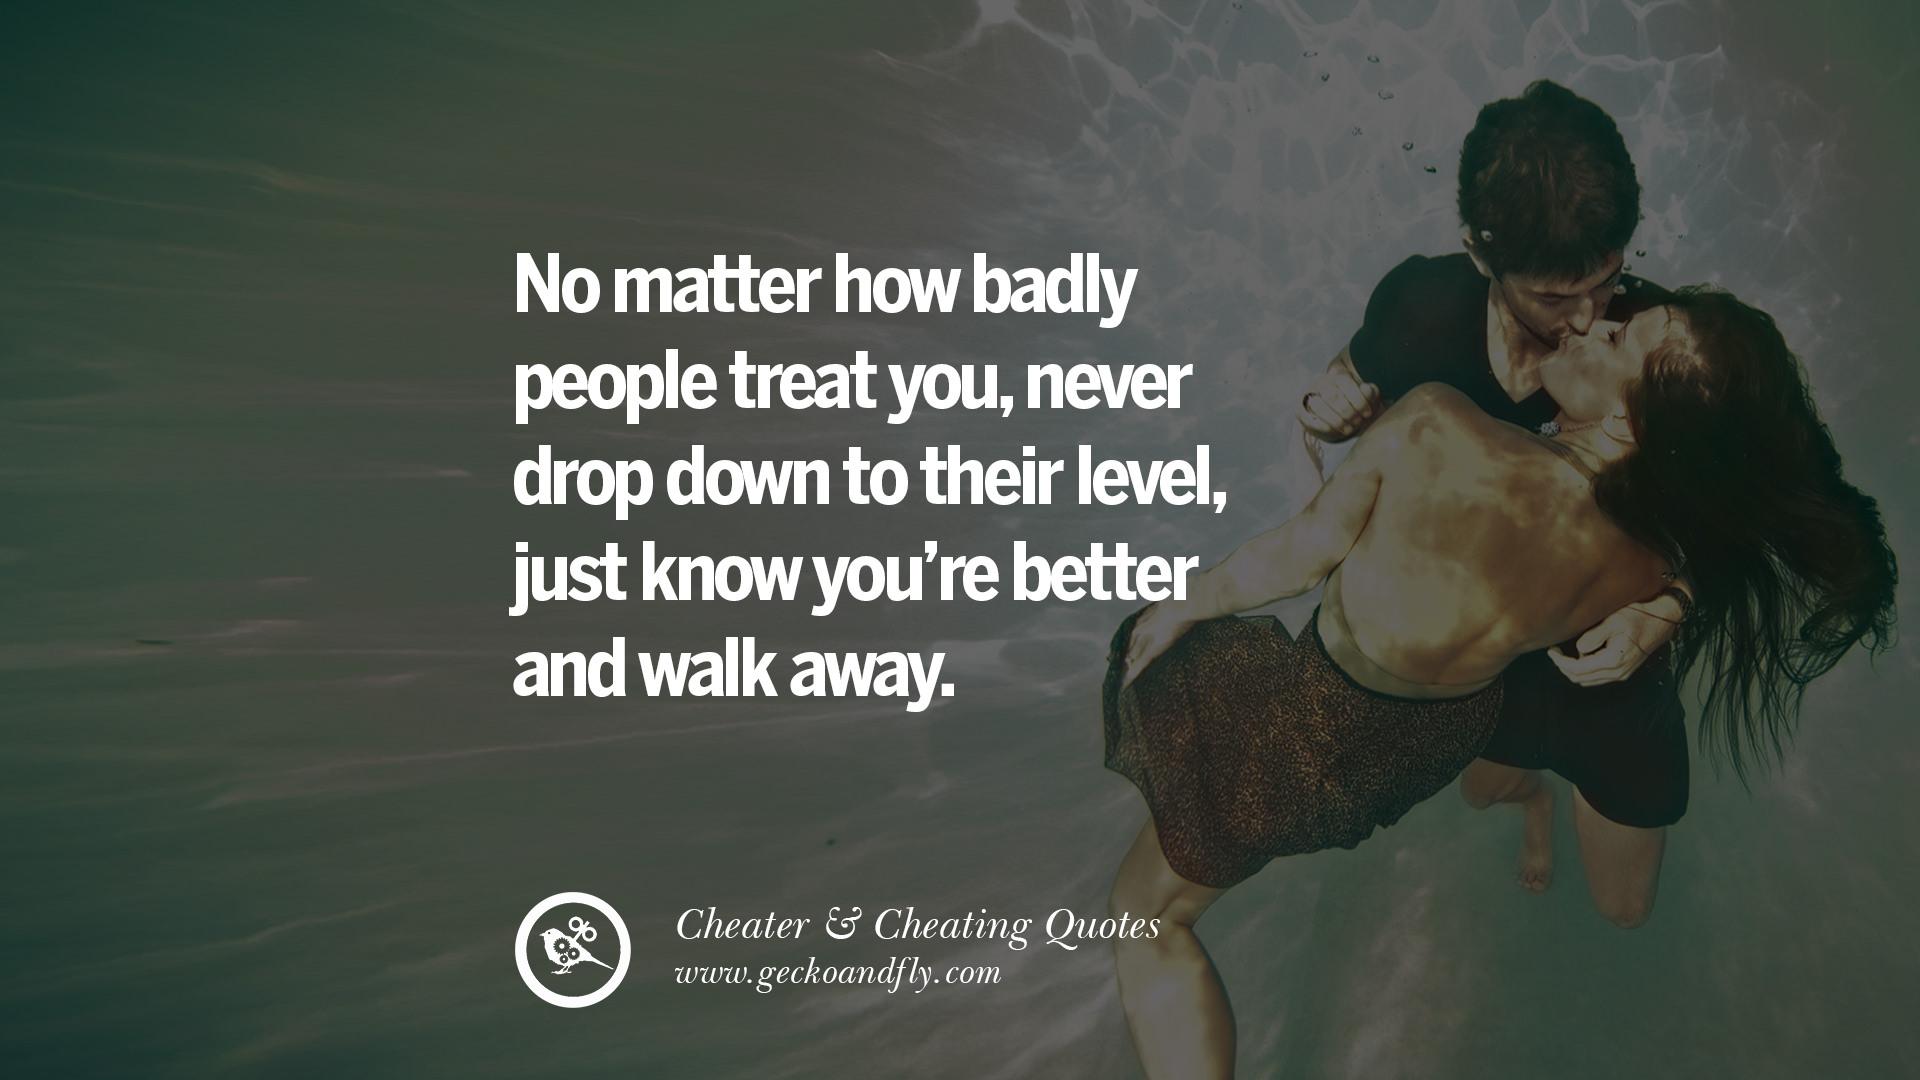 Broken Heart Sad Girl Wallpaper 60 Quotes On Cheating Boyfriend And Lying Husband